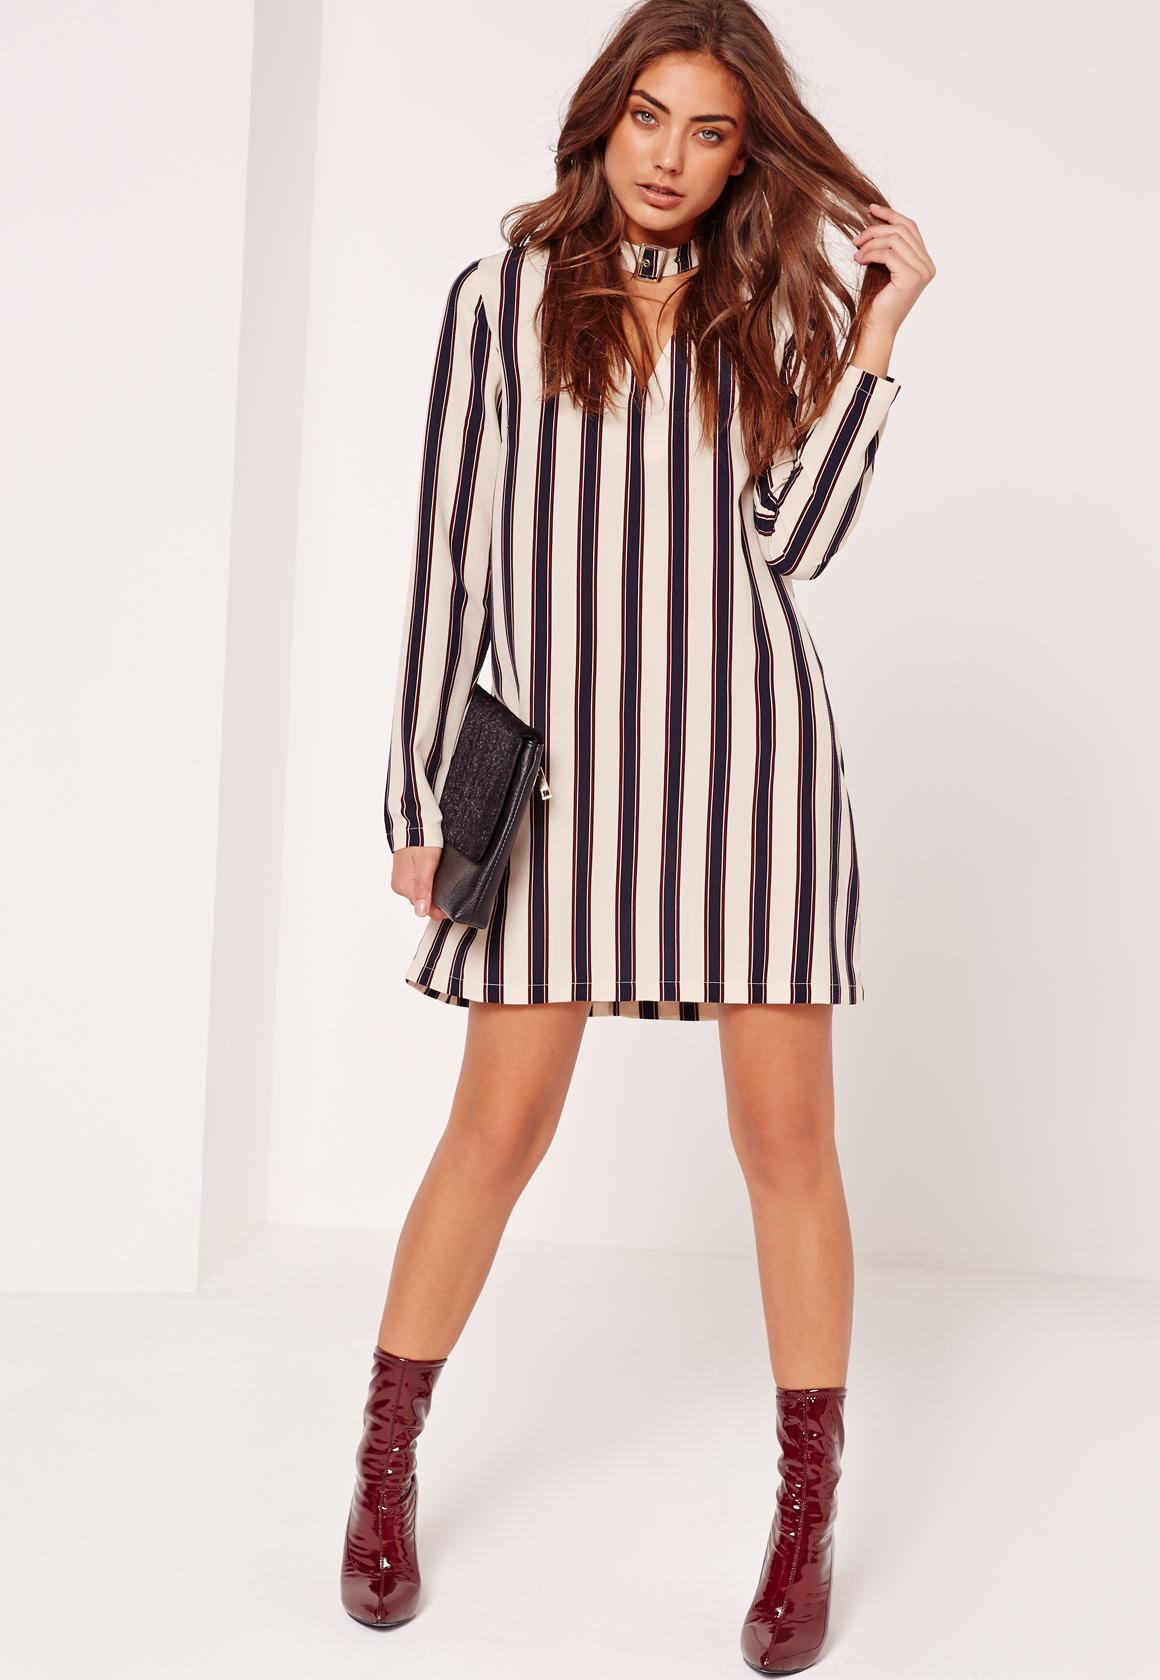 Stripe Buckle Choker Neck Shift Dress Cream